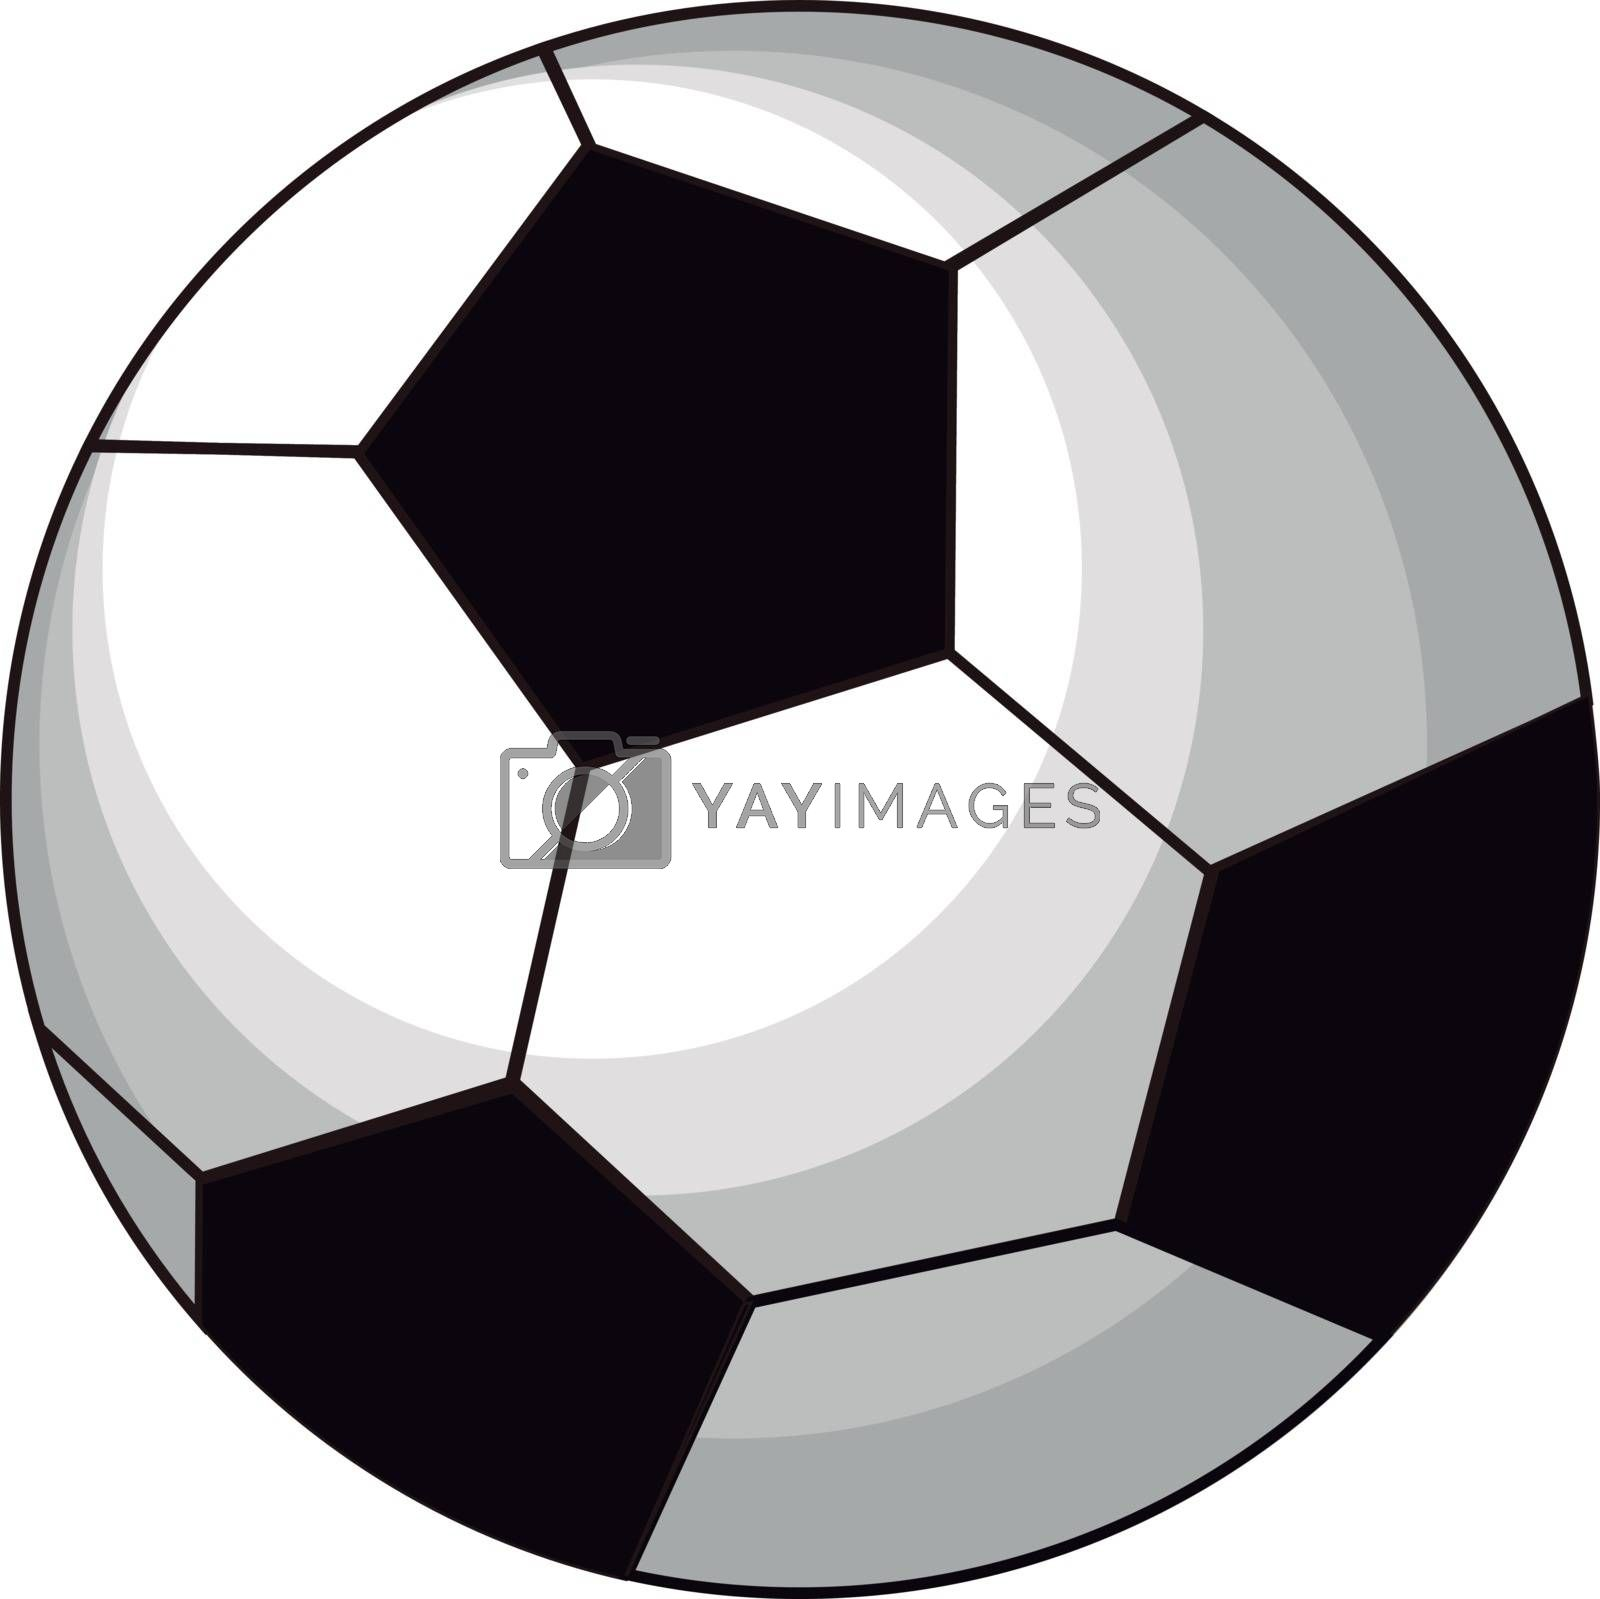 Football ball, illustration, vector on white background.